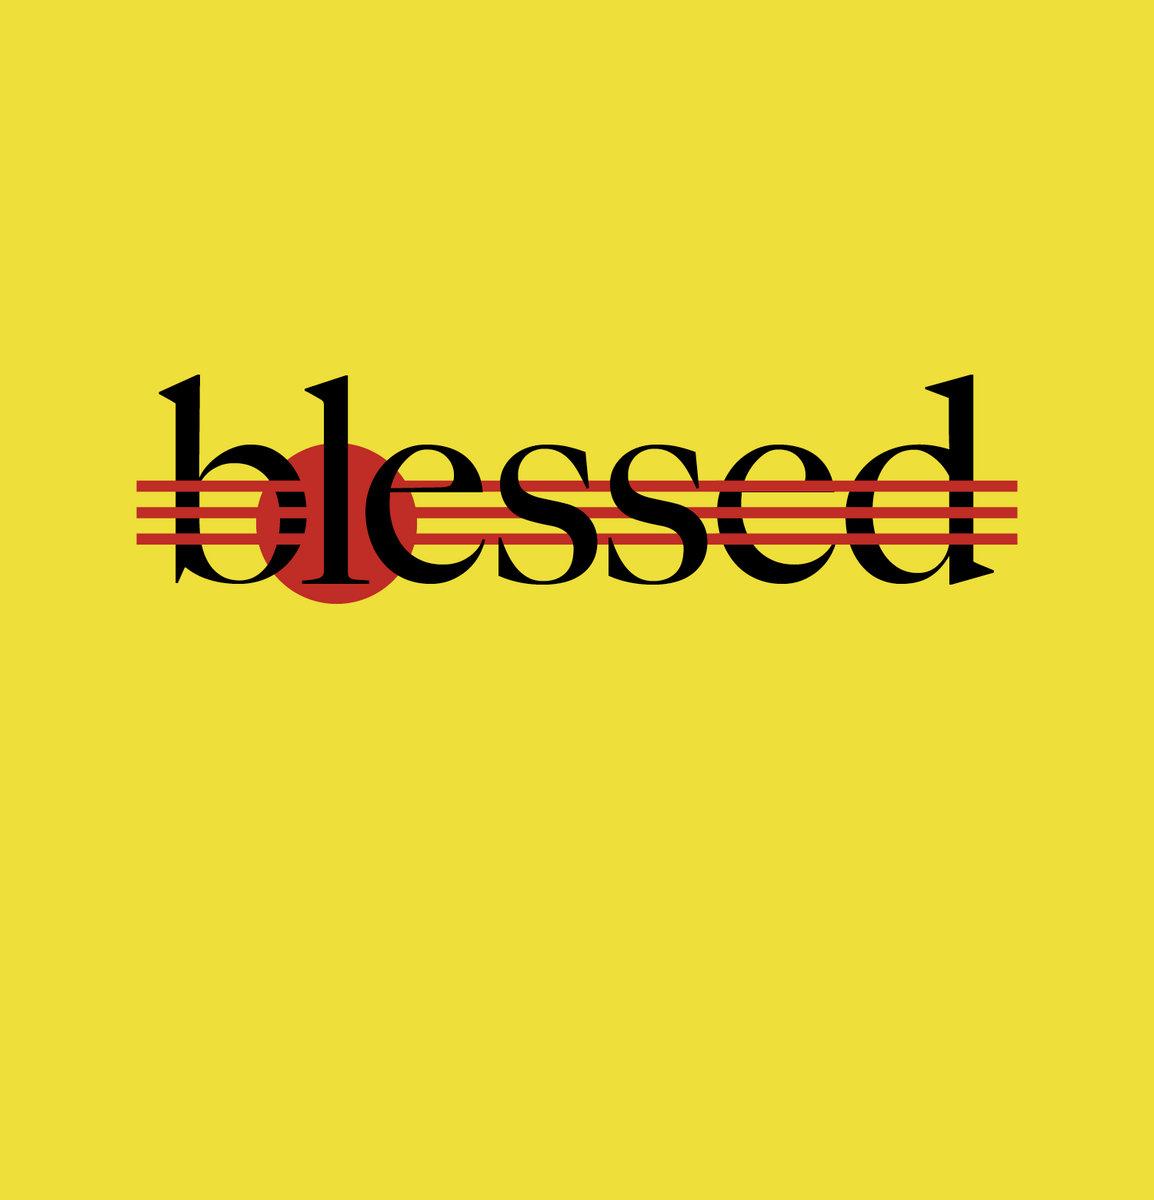 https://blessedband.bandcamp.com/album/blessed